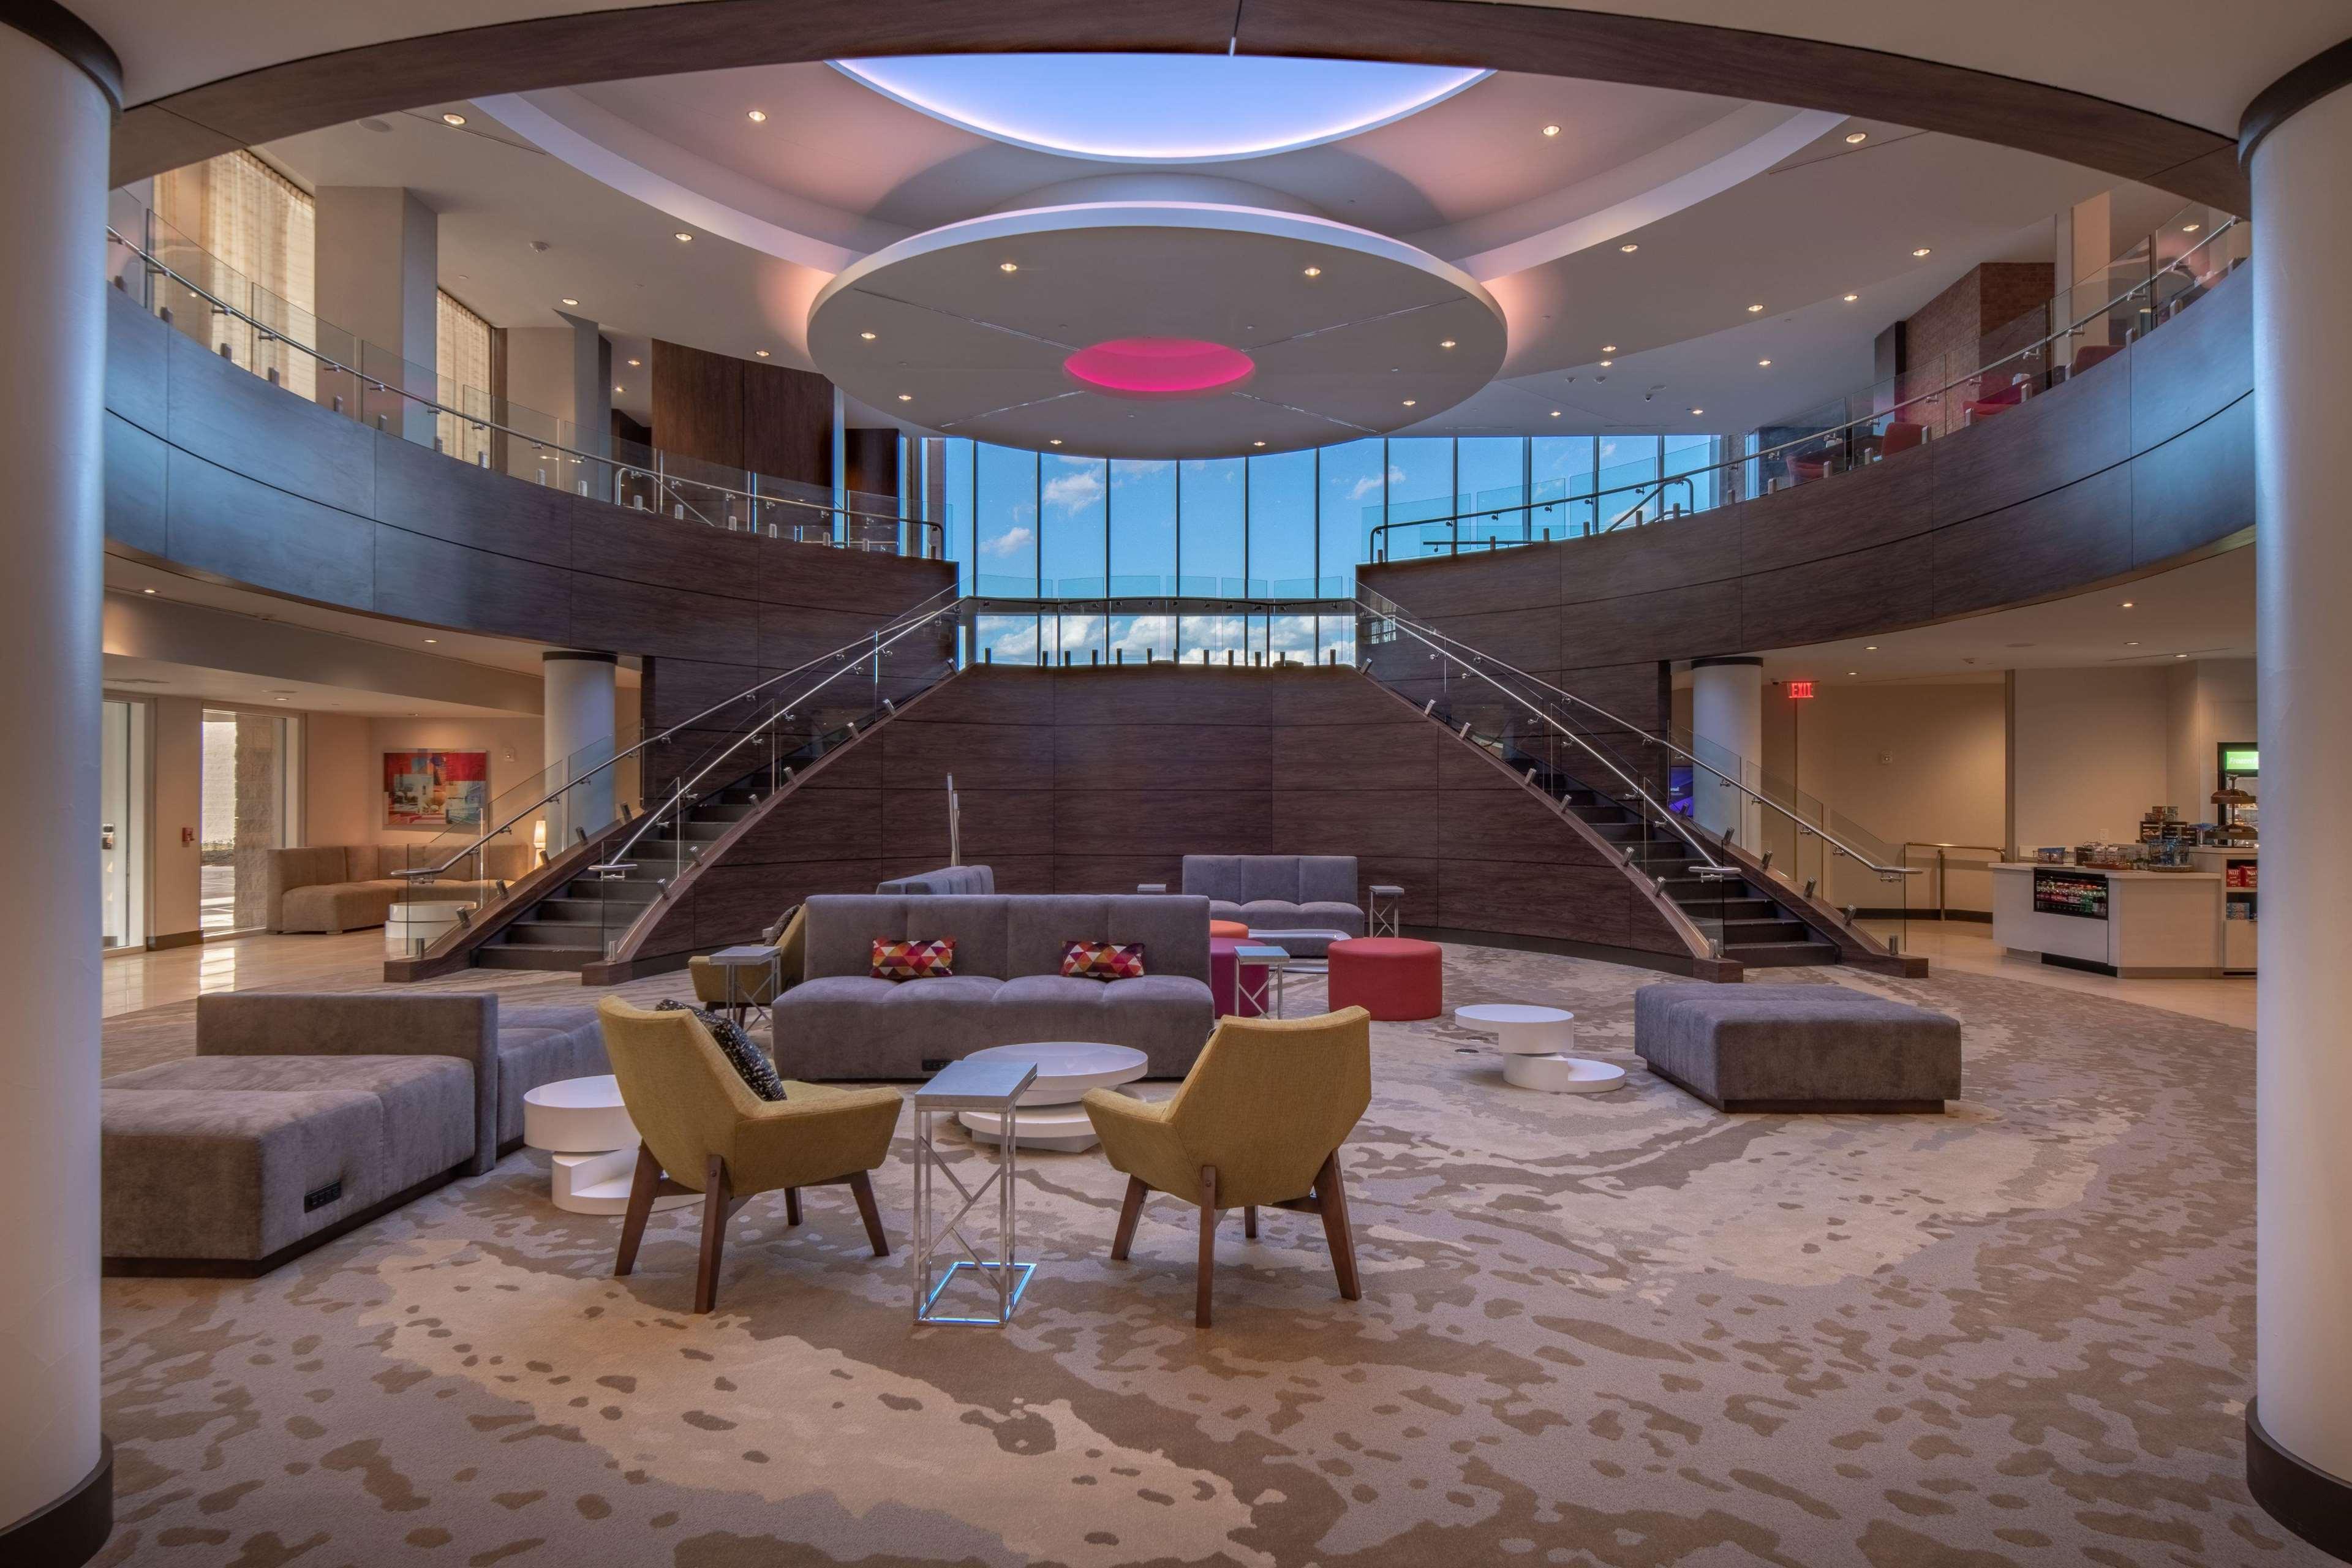 Hilton Garden Inn Dallas at Hurst Conference Center image 10